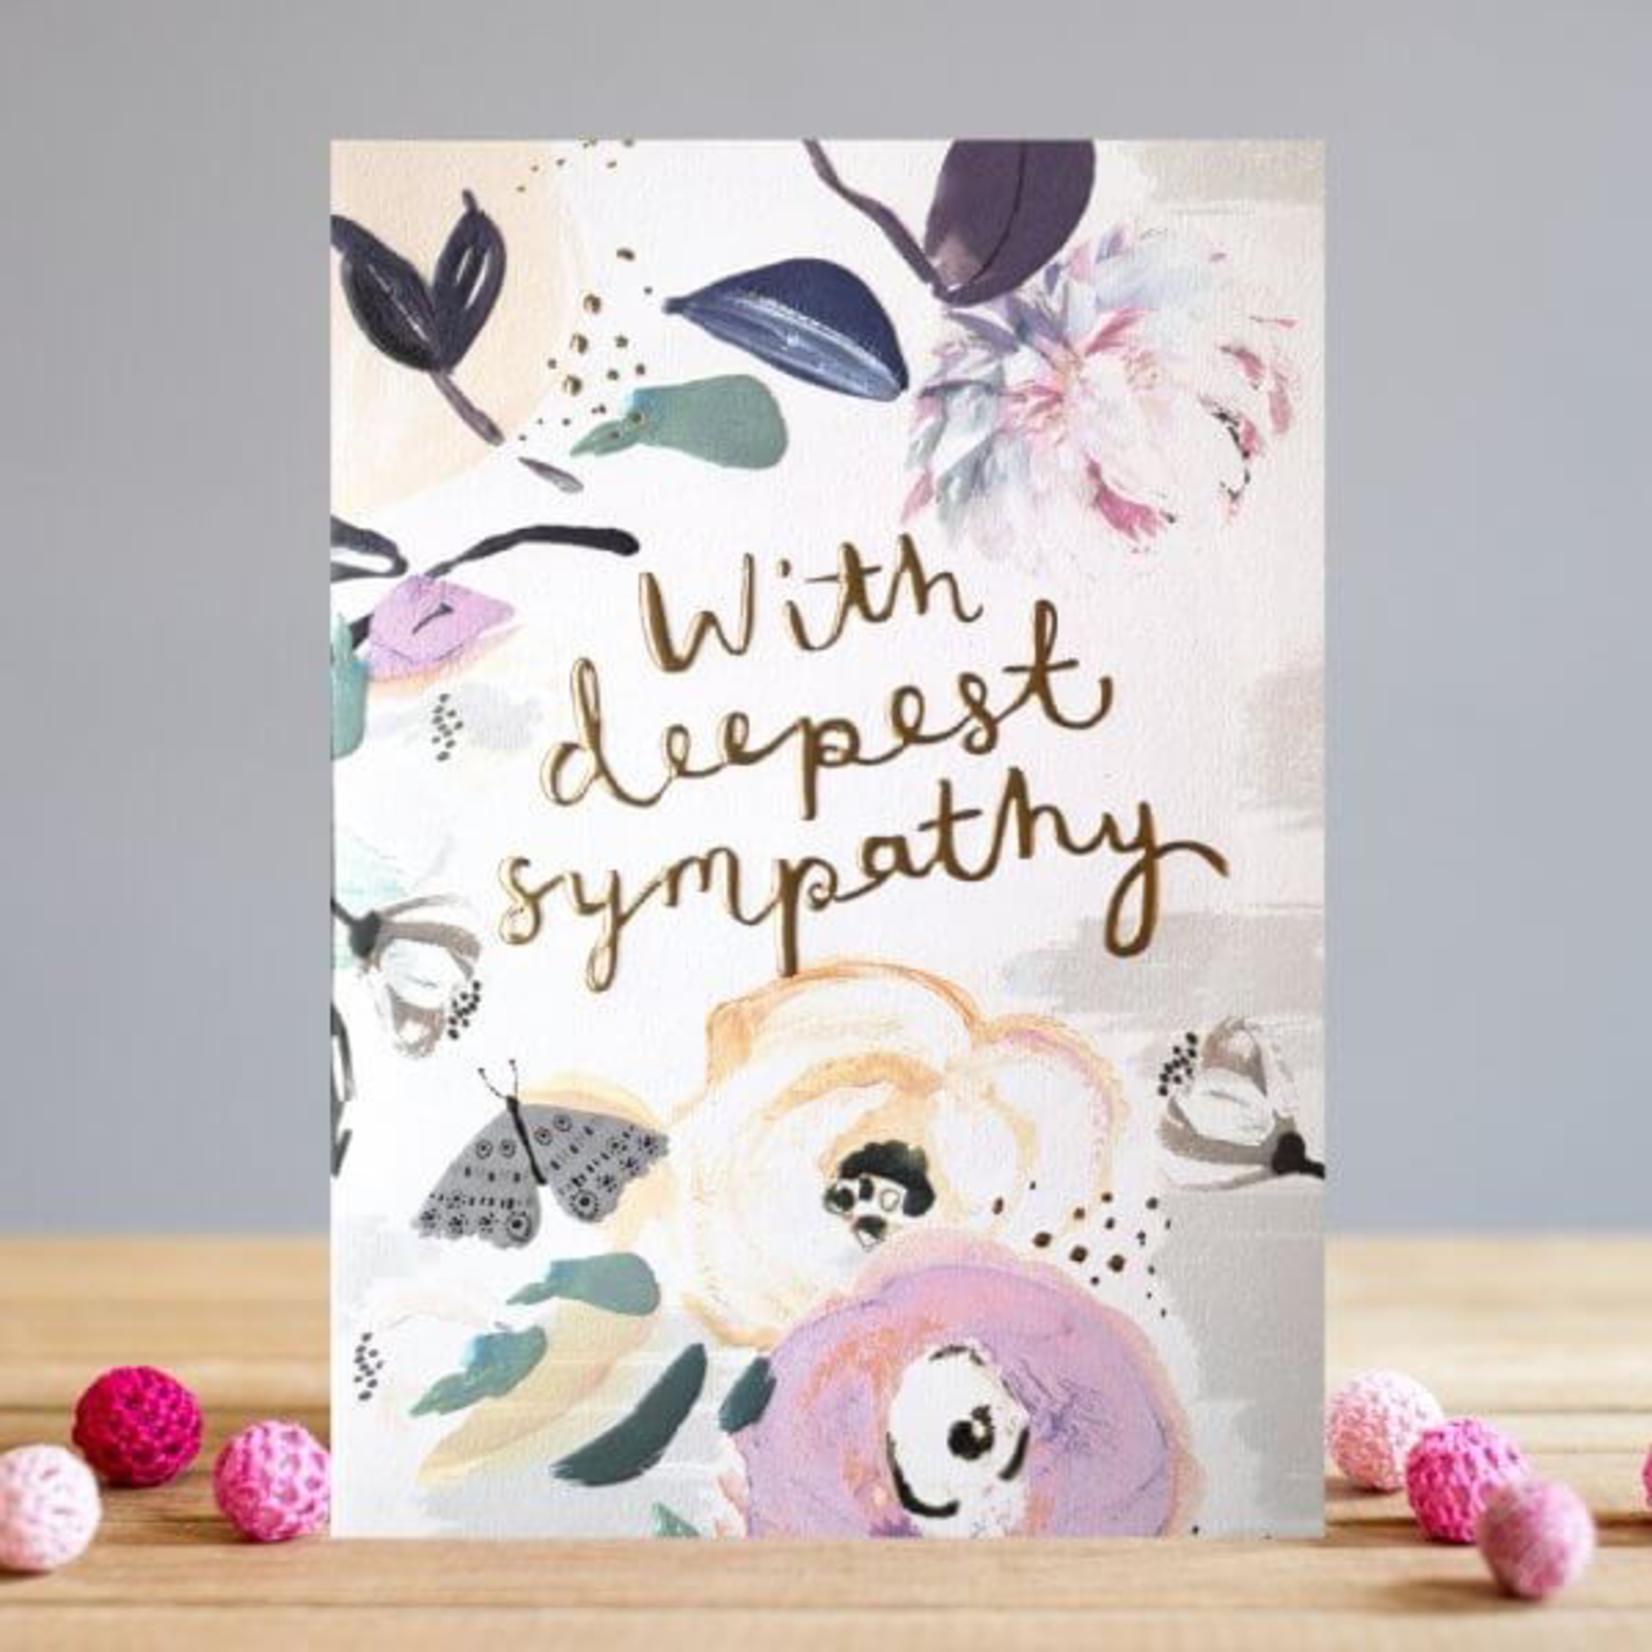 Louise Tiler Floral Sympathy Card